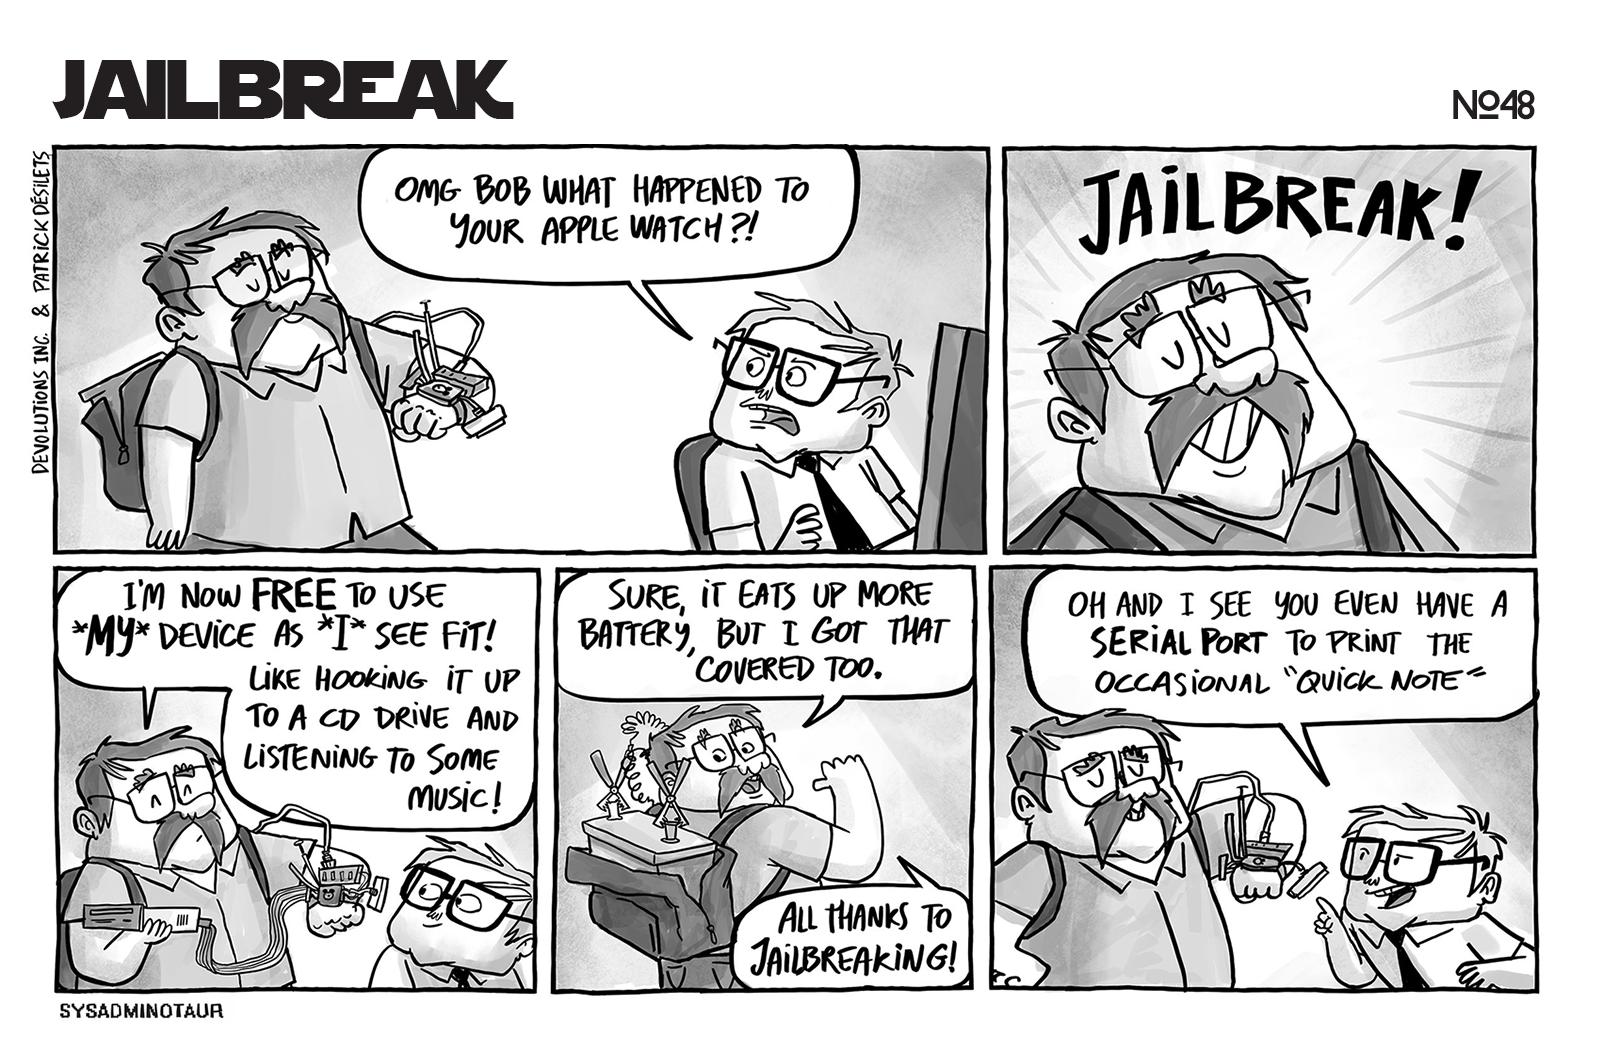 Jailbreak Sysadminotaur #48 - IT comic for the IT world